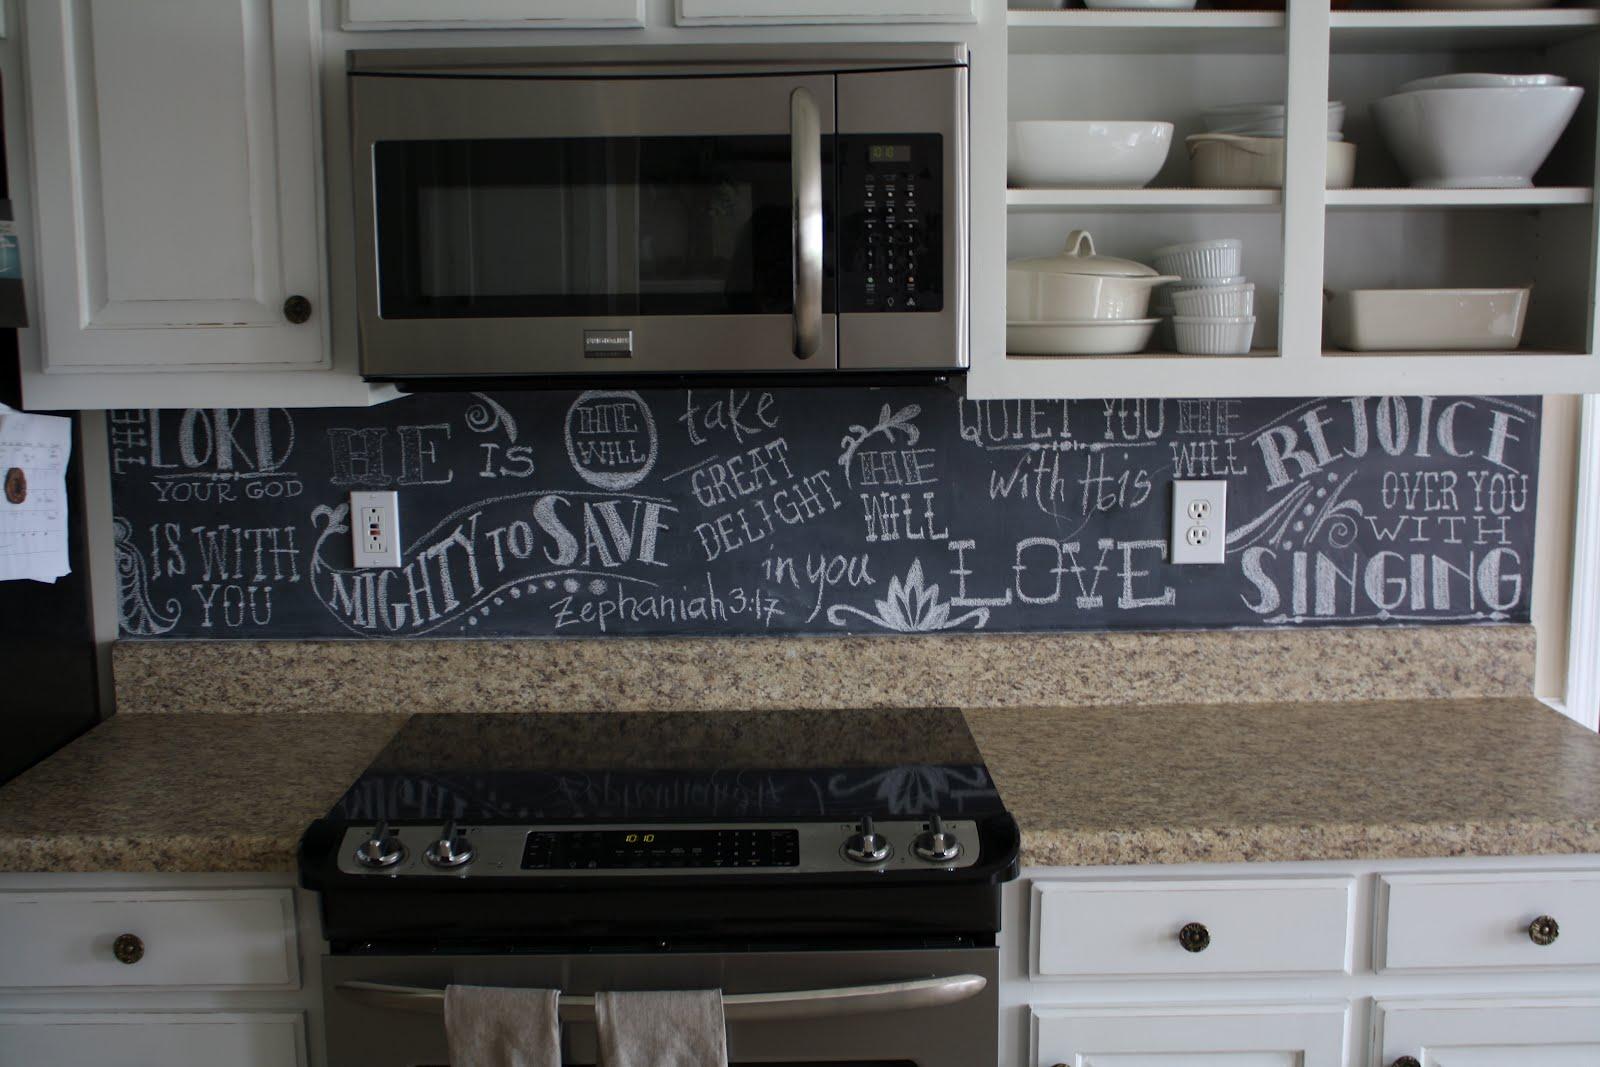 Chalkboard In Kitchen Silverware John And Melanie Backsplash